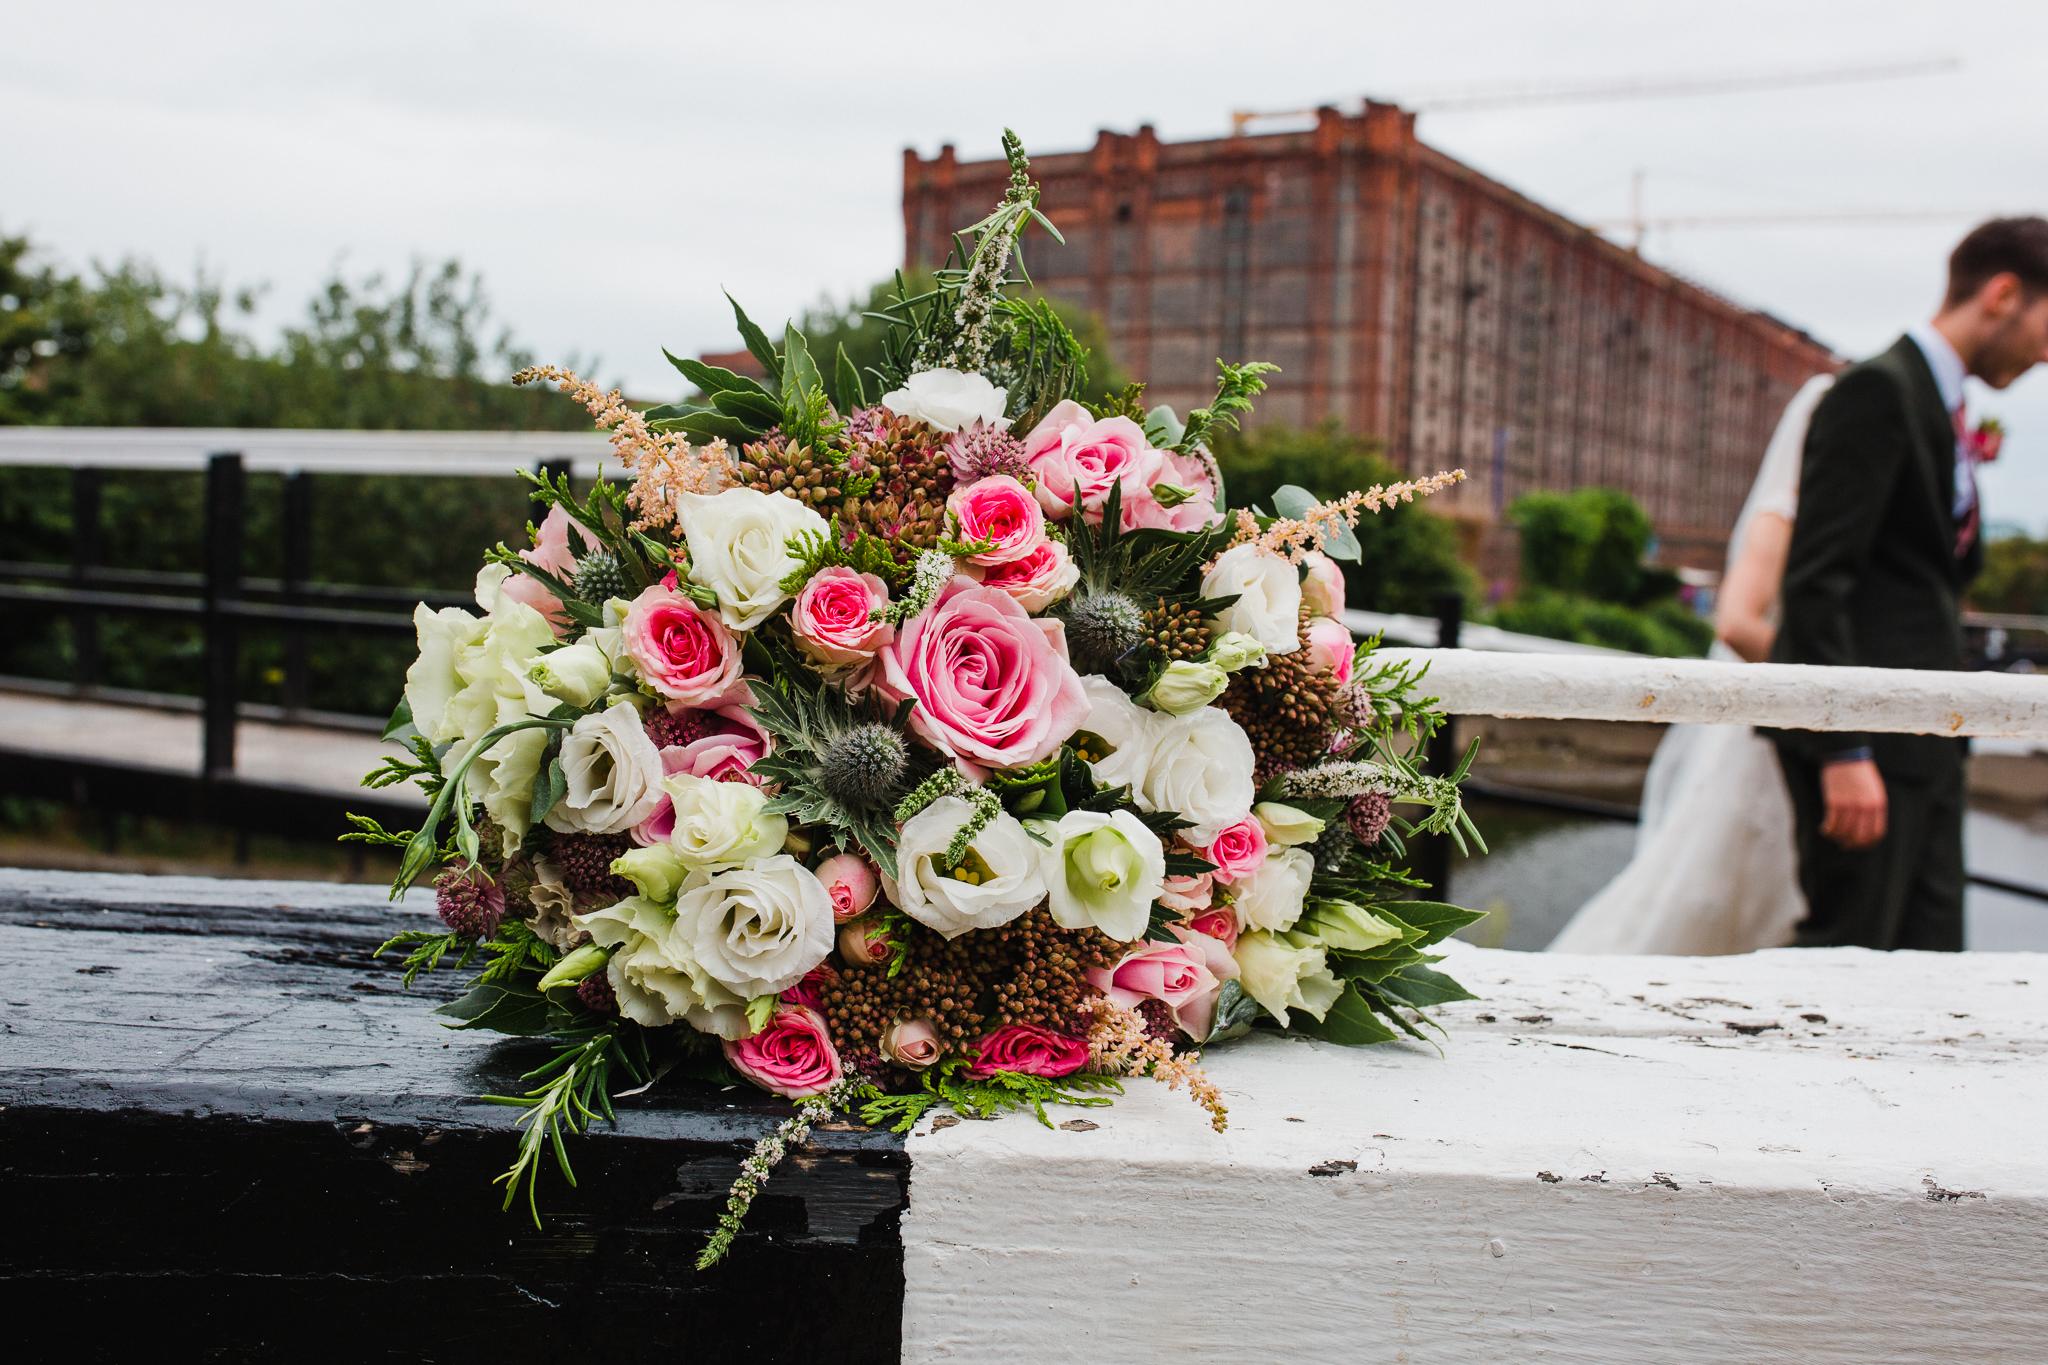 Jess and Ben - Liverpool wedding - bridal flower bouquet